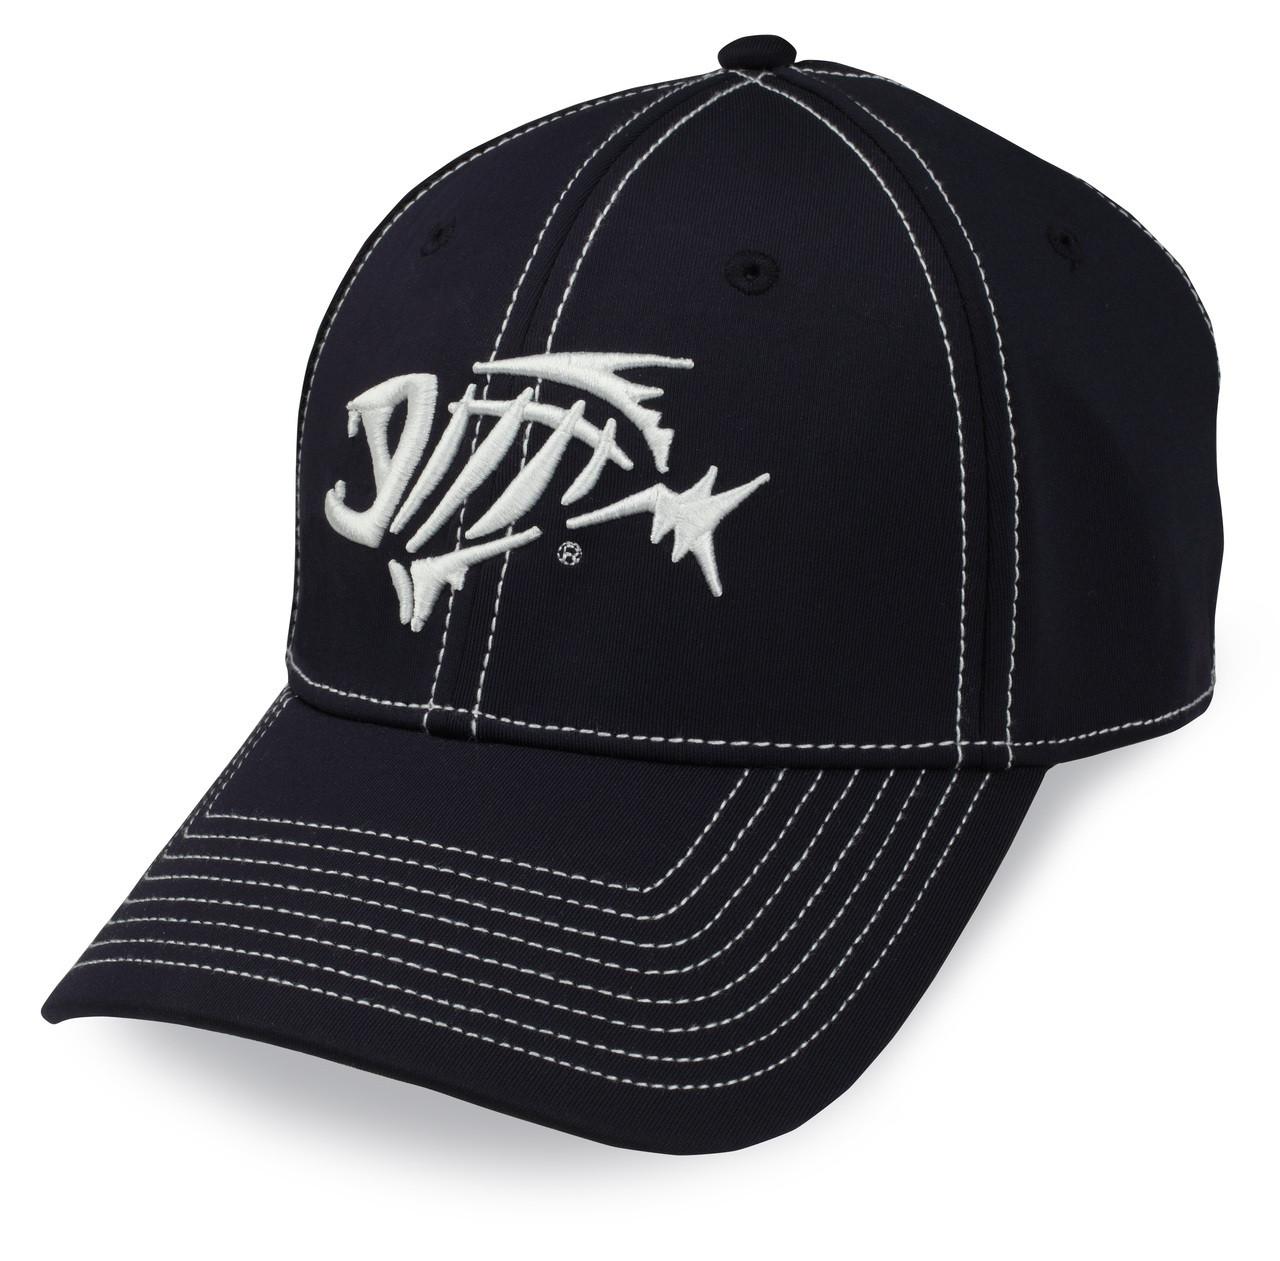 G. Loomis - A-Flex Technical Cap, Navy